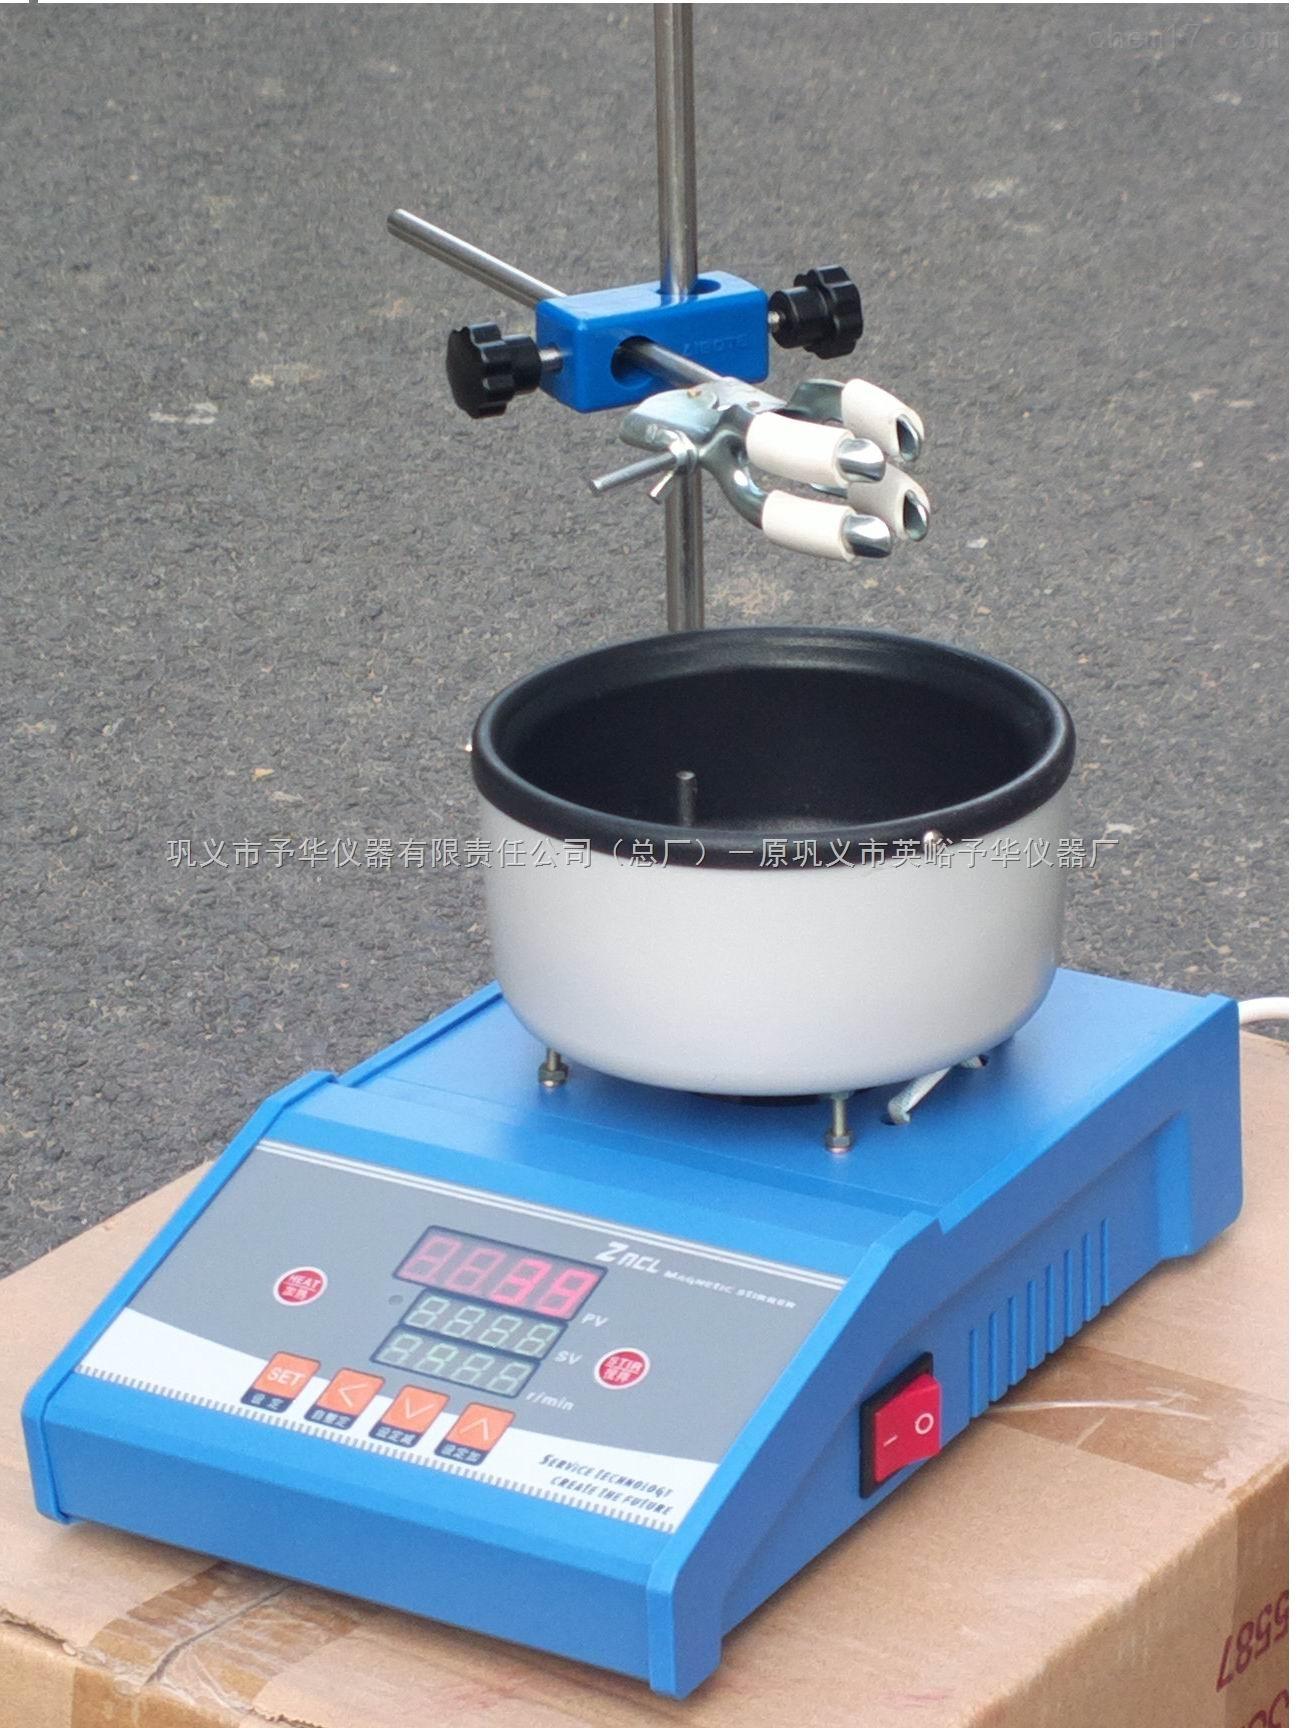 ZNCL-GS智能数显磁力搅拌器